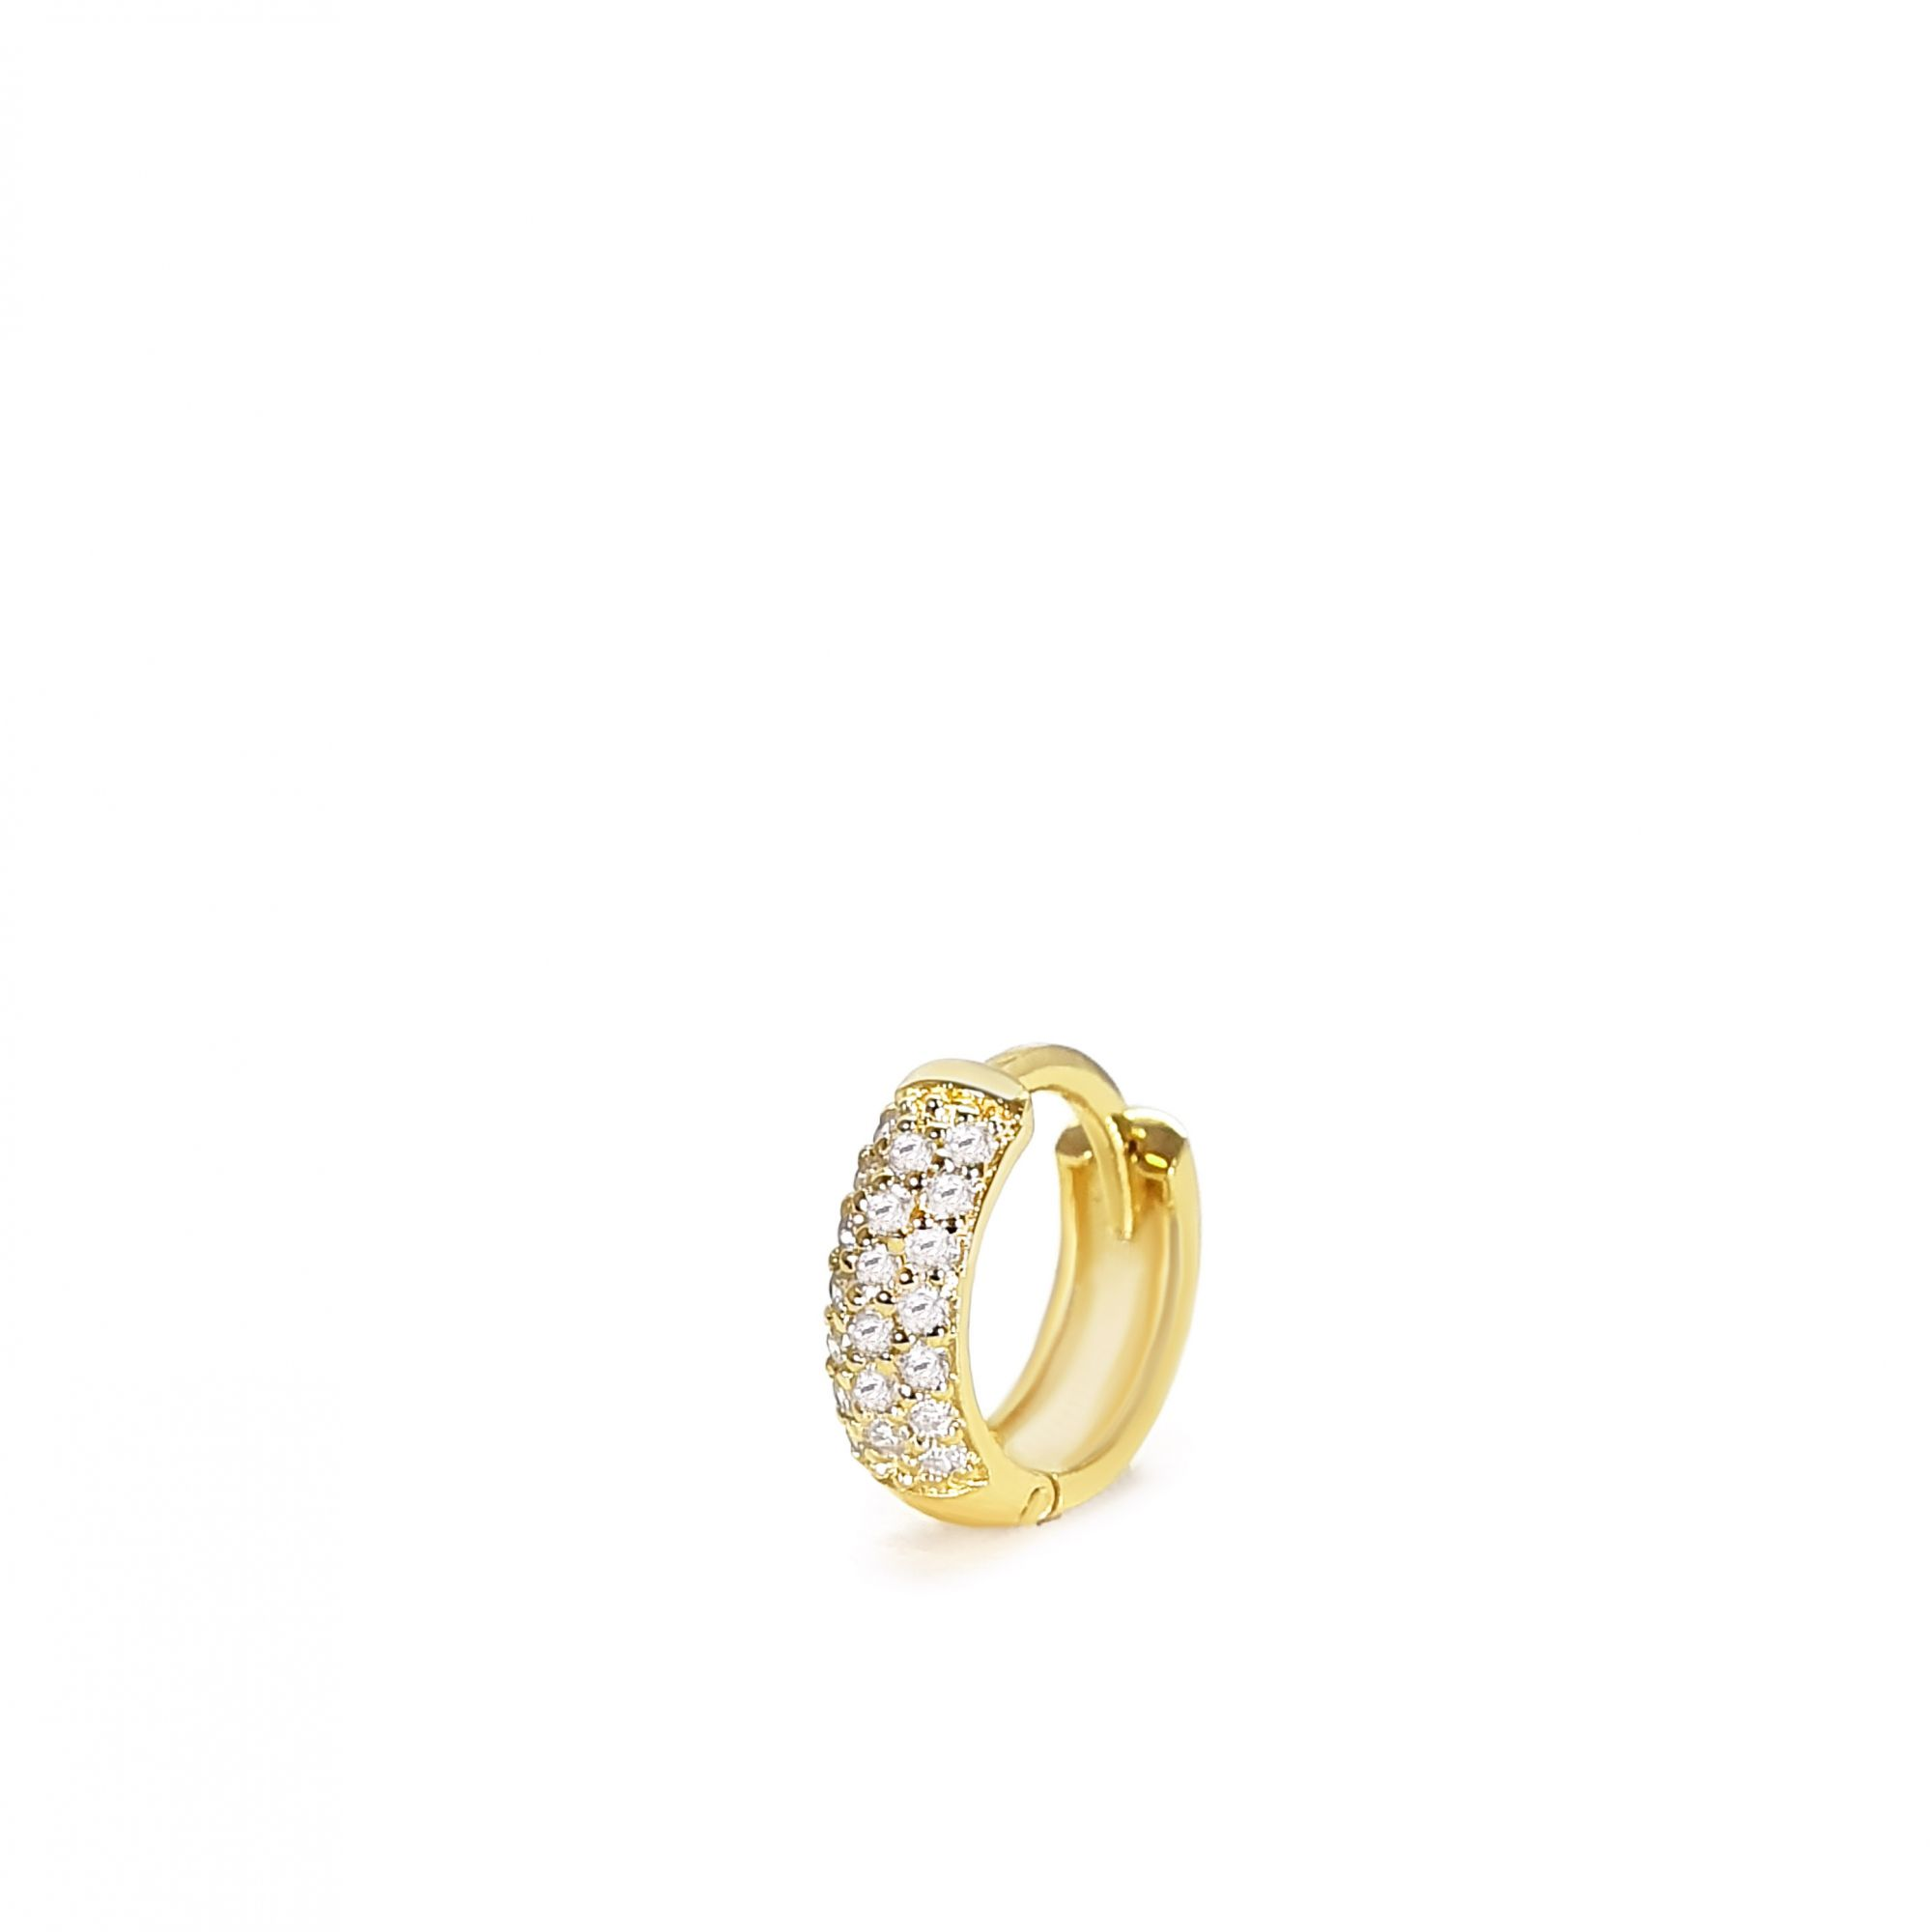 Piercing Ouro 18k Argola com Diamantes